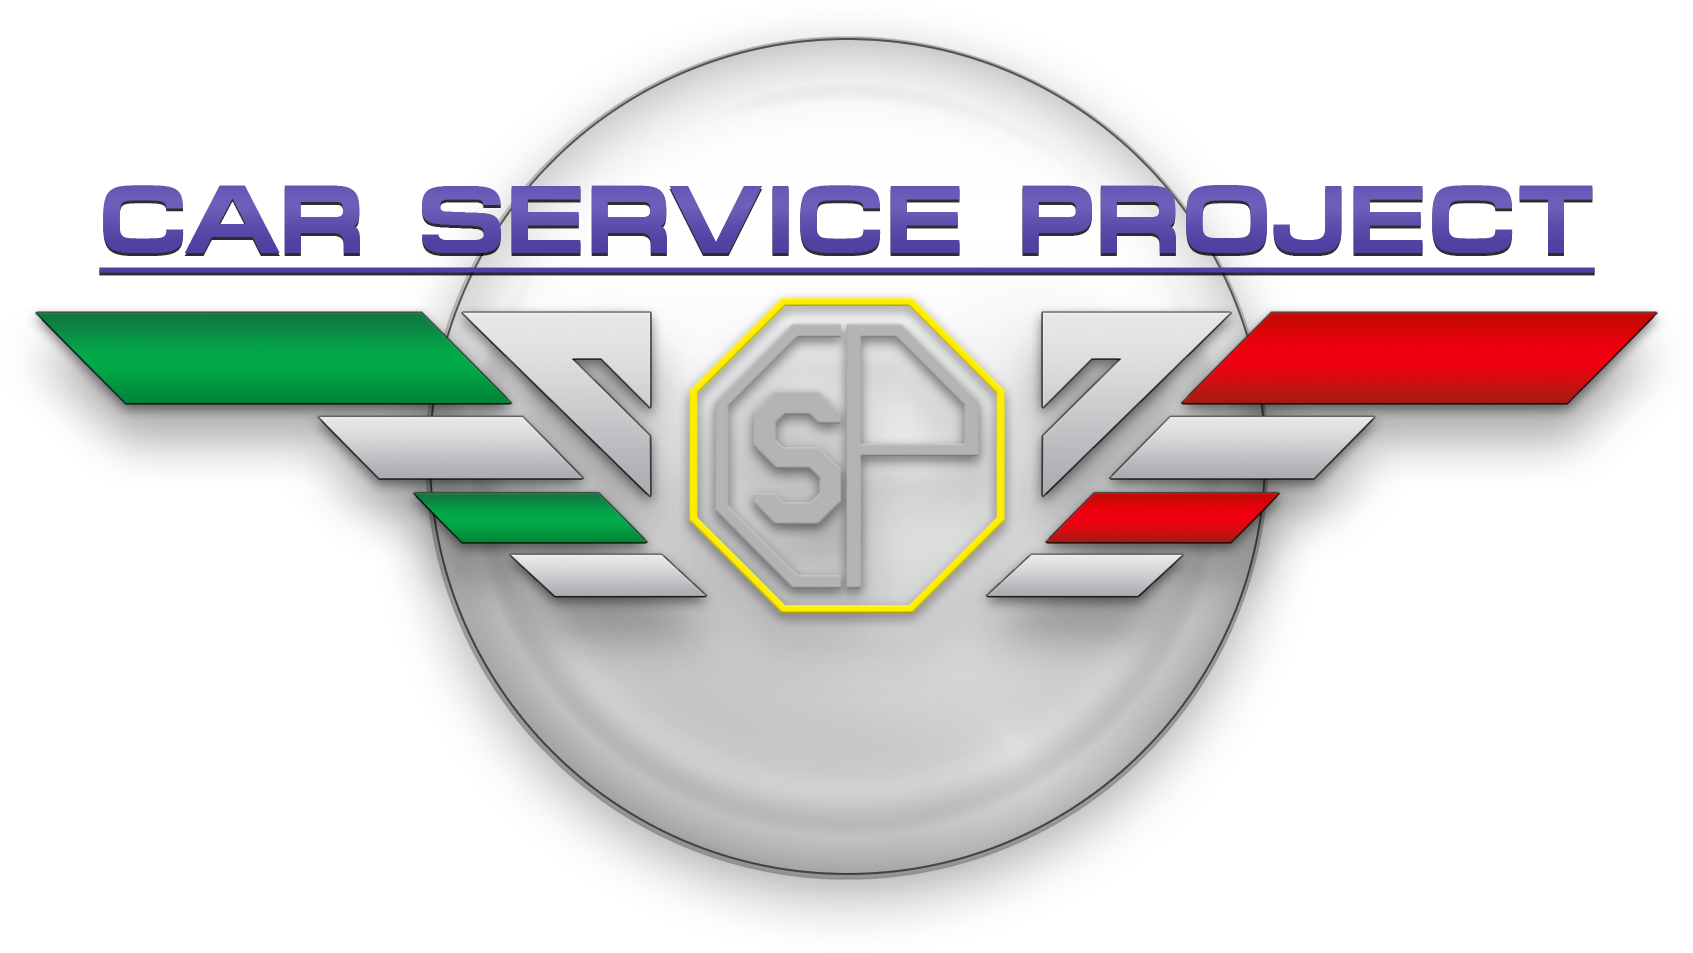 Car Service Project